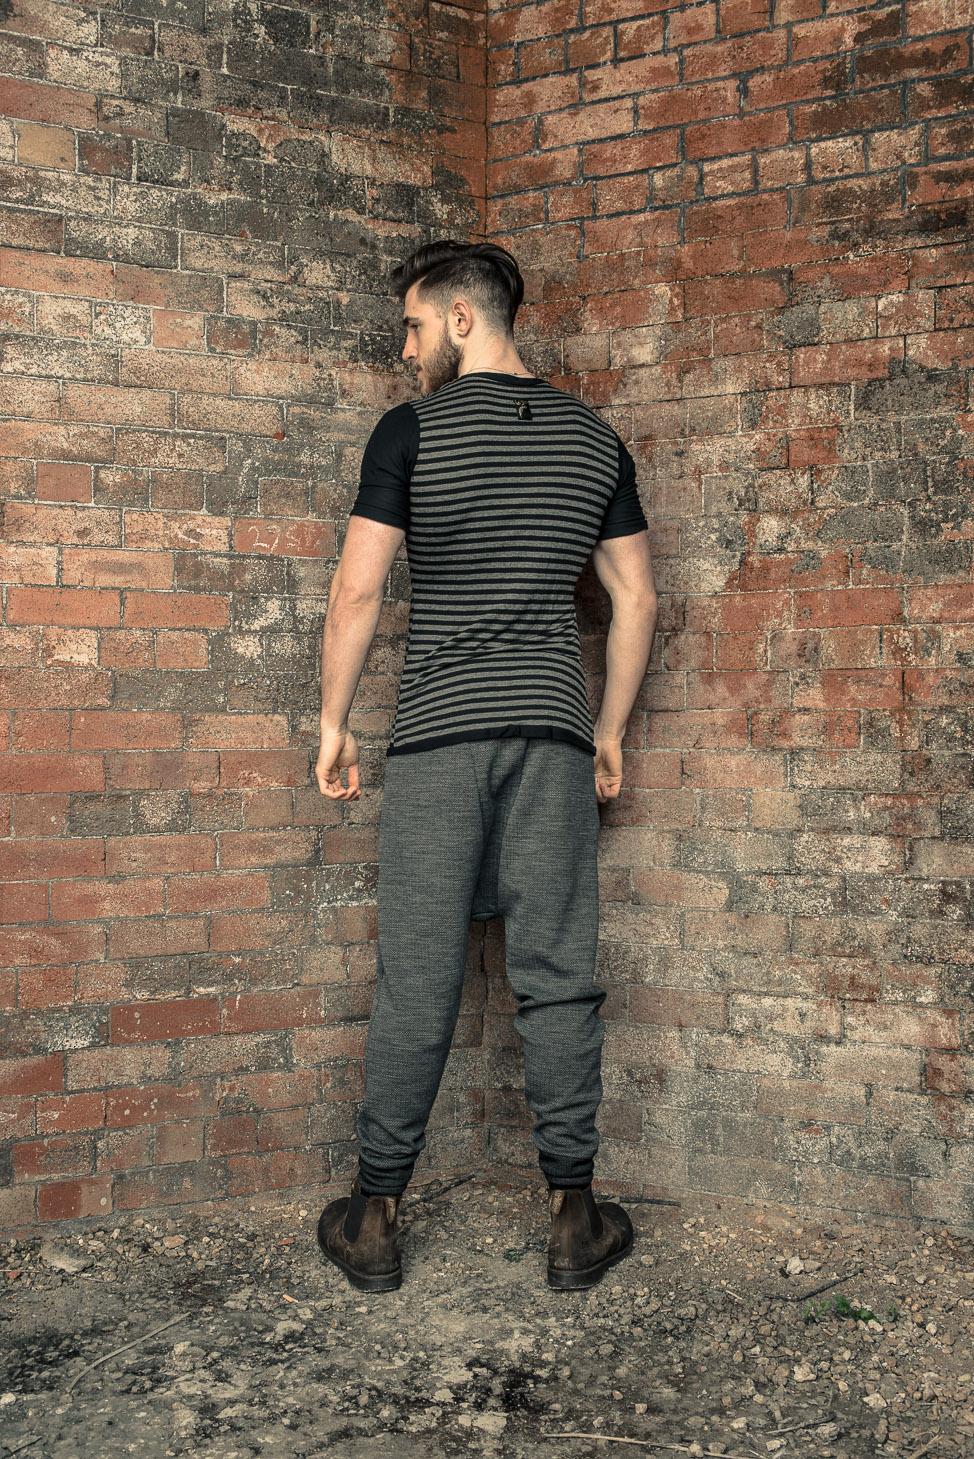 zaramia-ava-zaramiaava-leeds-fashion-designer-ethical-sustainable-tailored-minimalist-fitted-versatile-drape-koji-grey-tshirt-top-hareem-trousers-black-grey-texture-styling-menswear-model-26